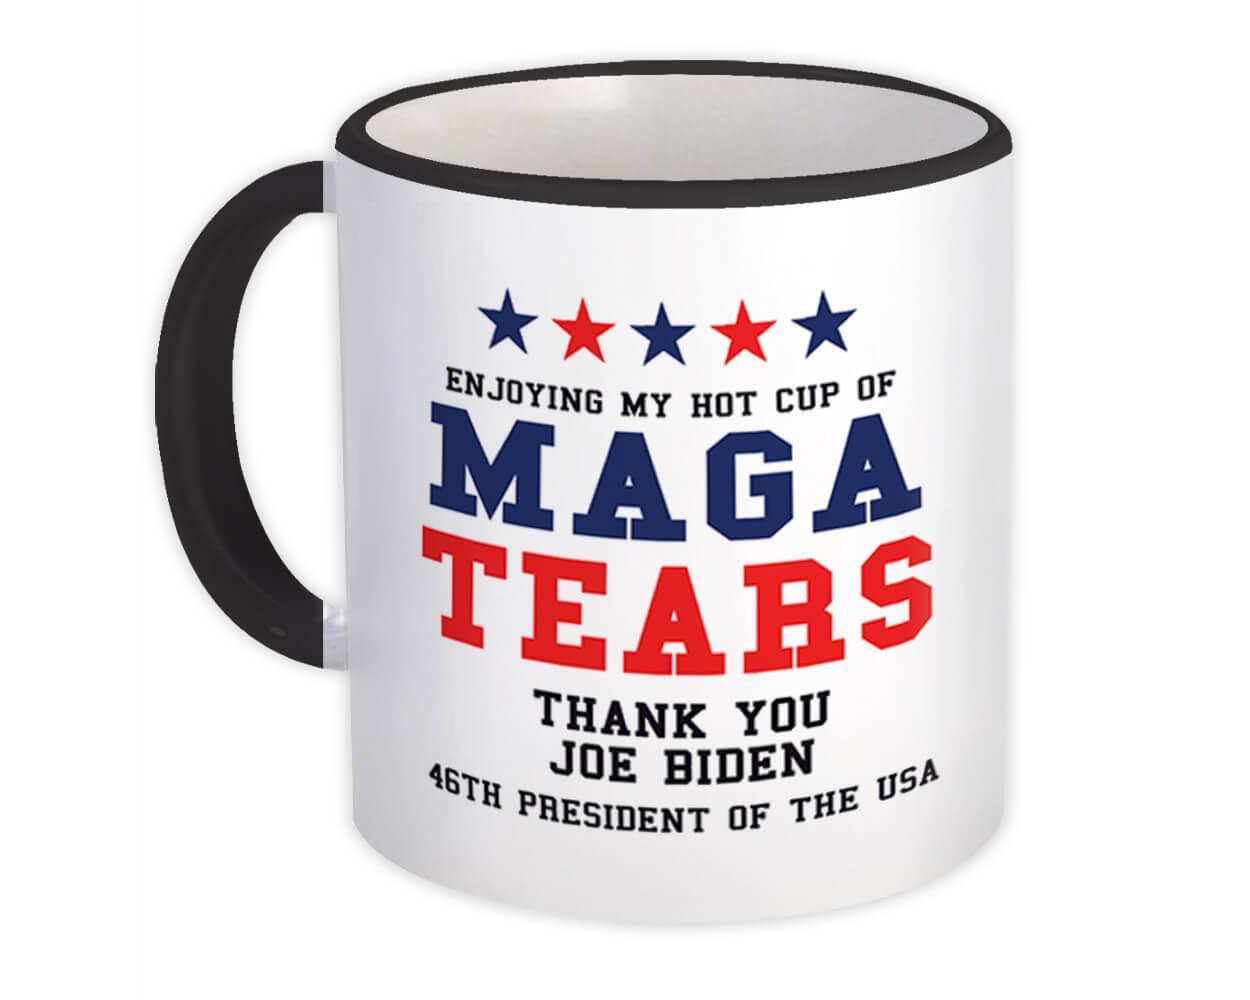 MAGA Tears Cup Joe Biden 46th President : Gift Mug Gag Anti Trump Democrat